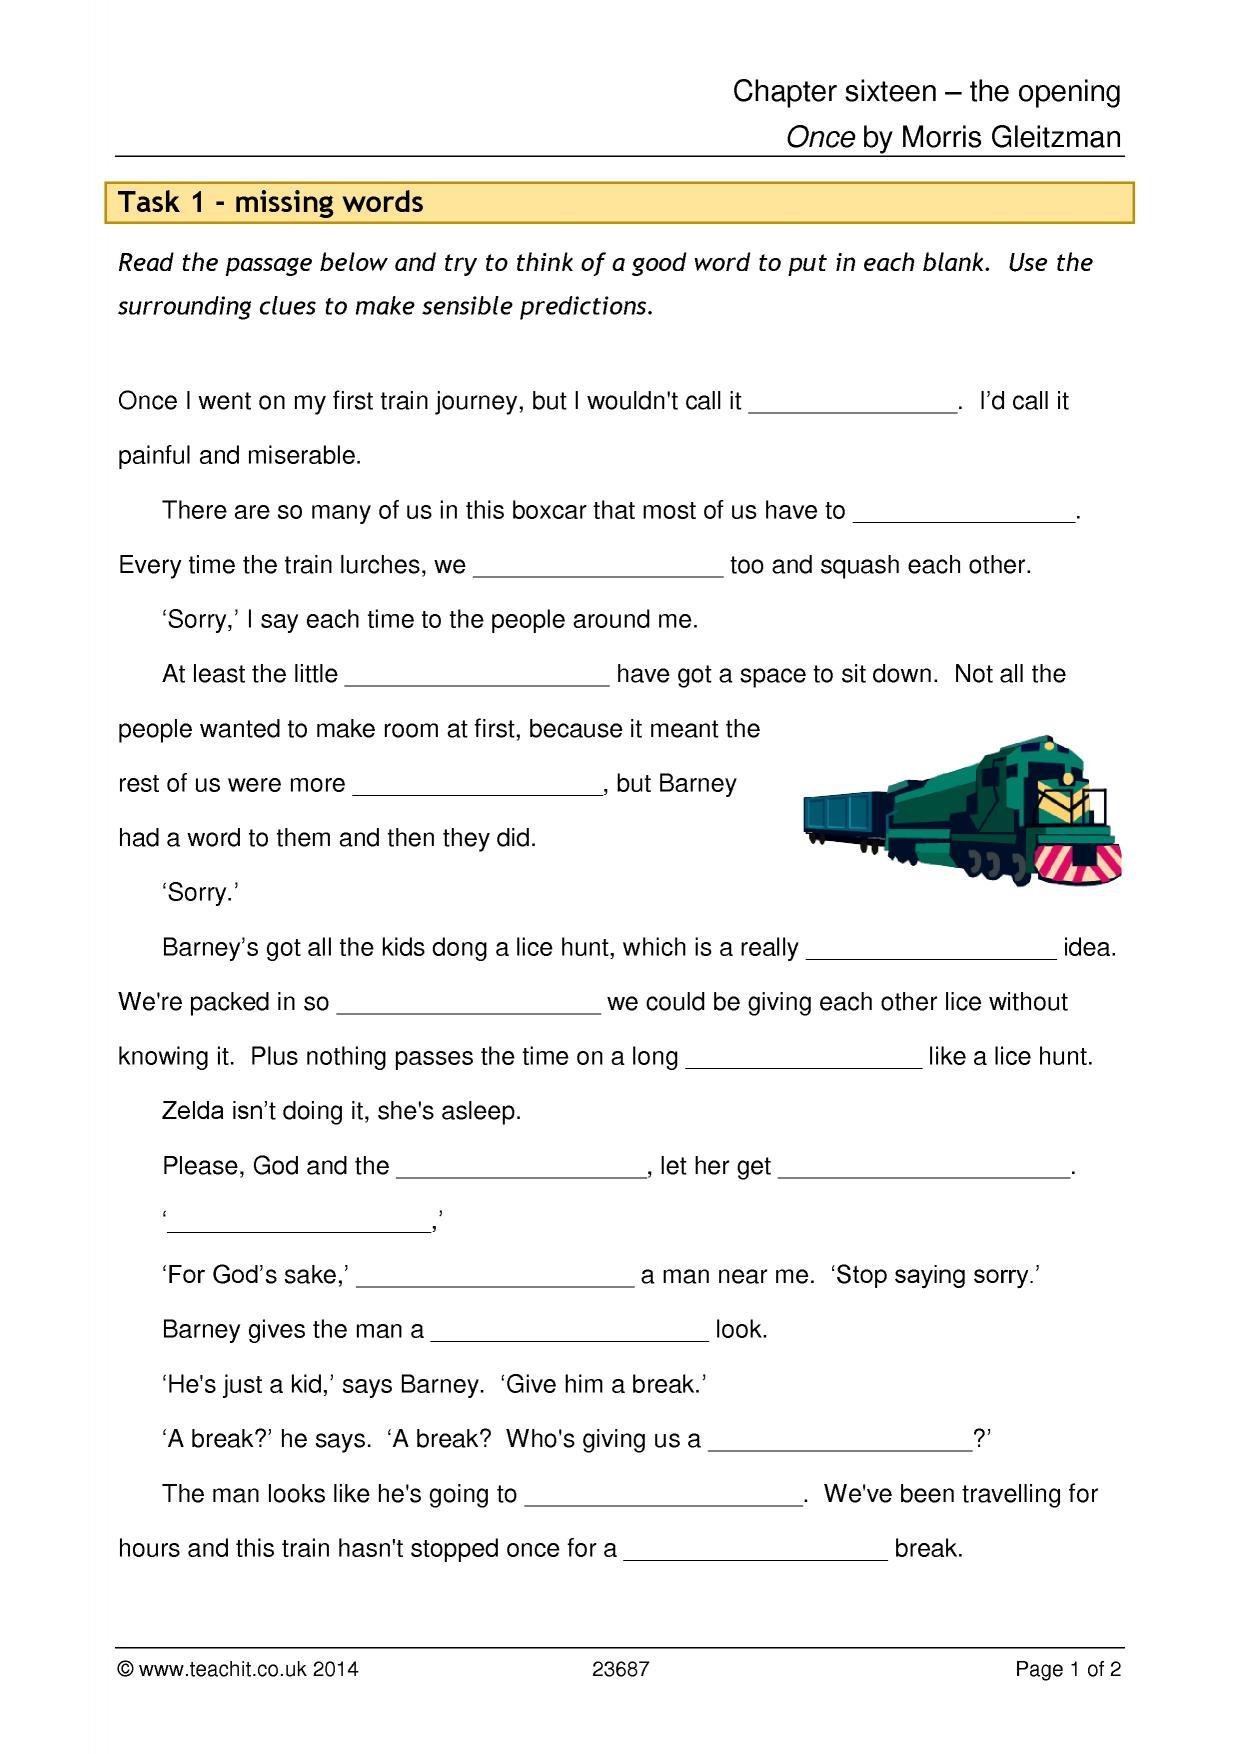 Once by Morris Gleitzman - PDF free download eBook